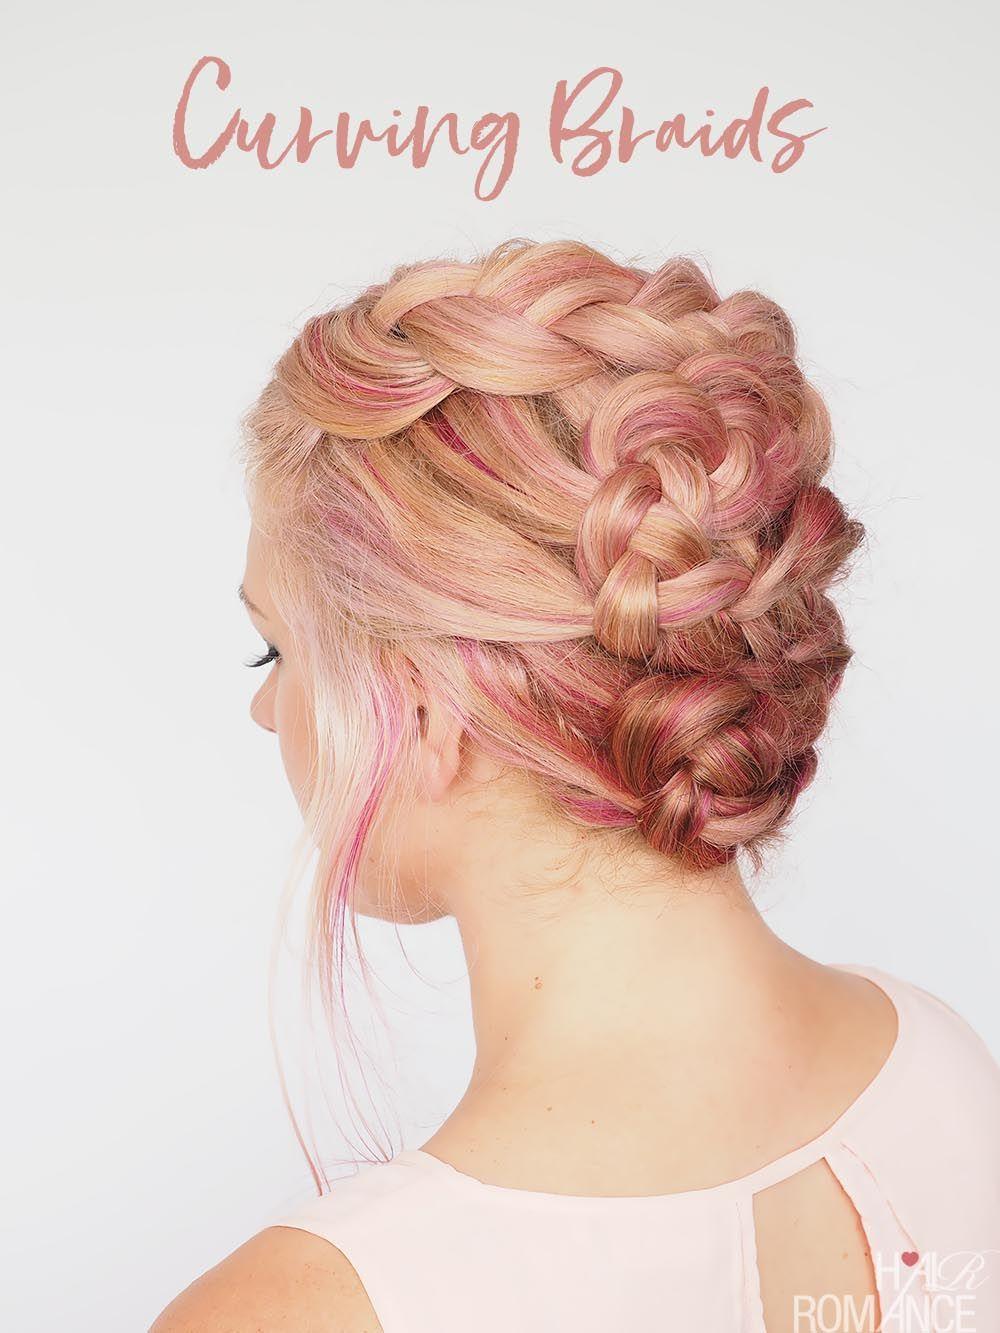 S curve braid tutorial a pretty braided upstyle hairstyles we